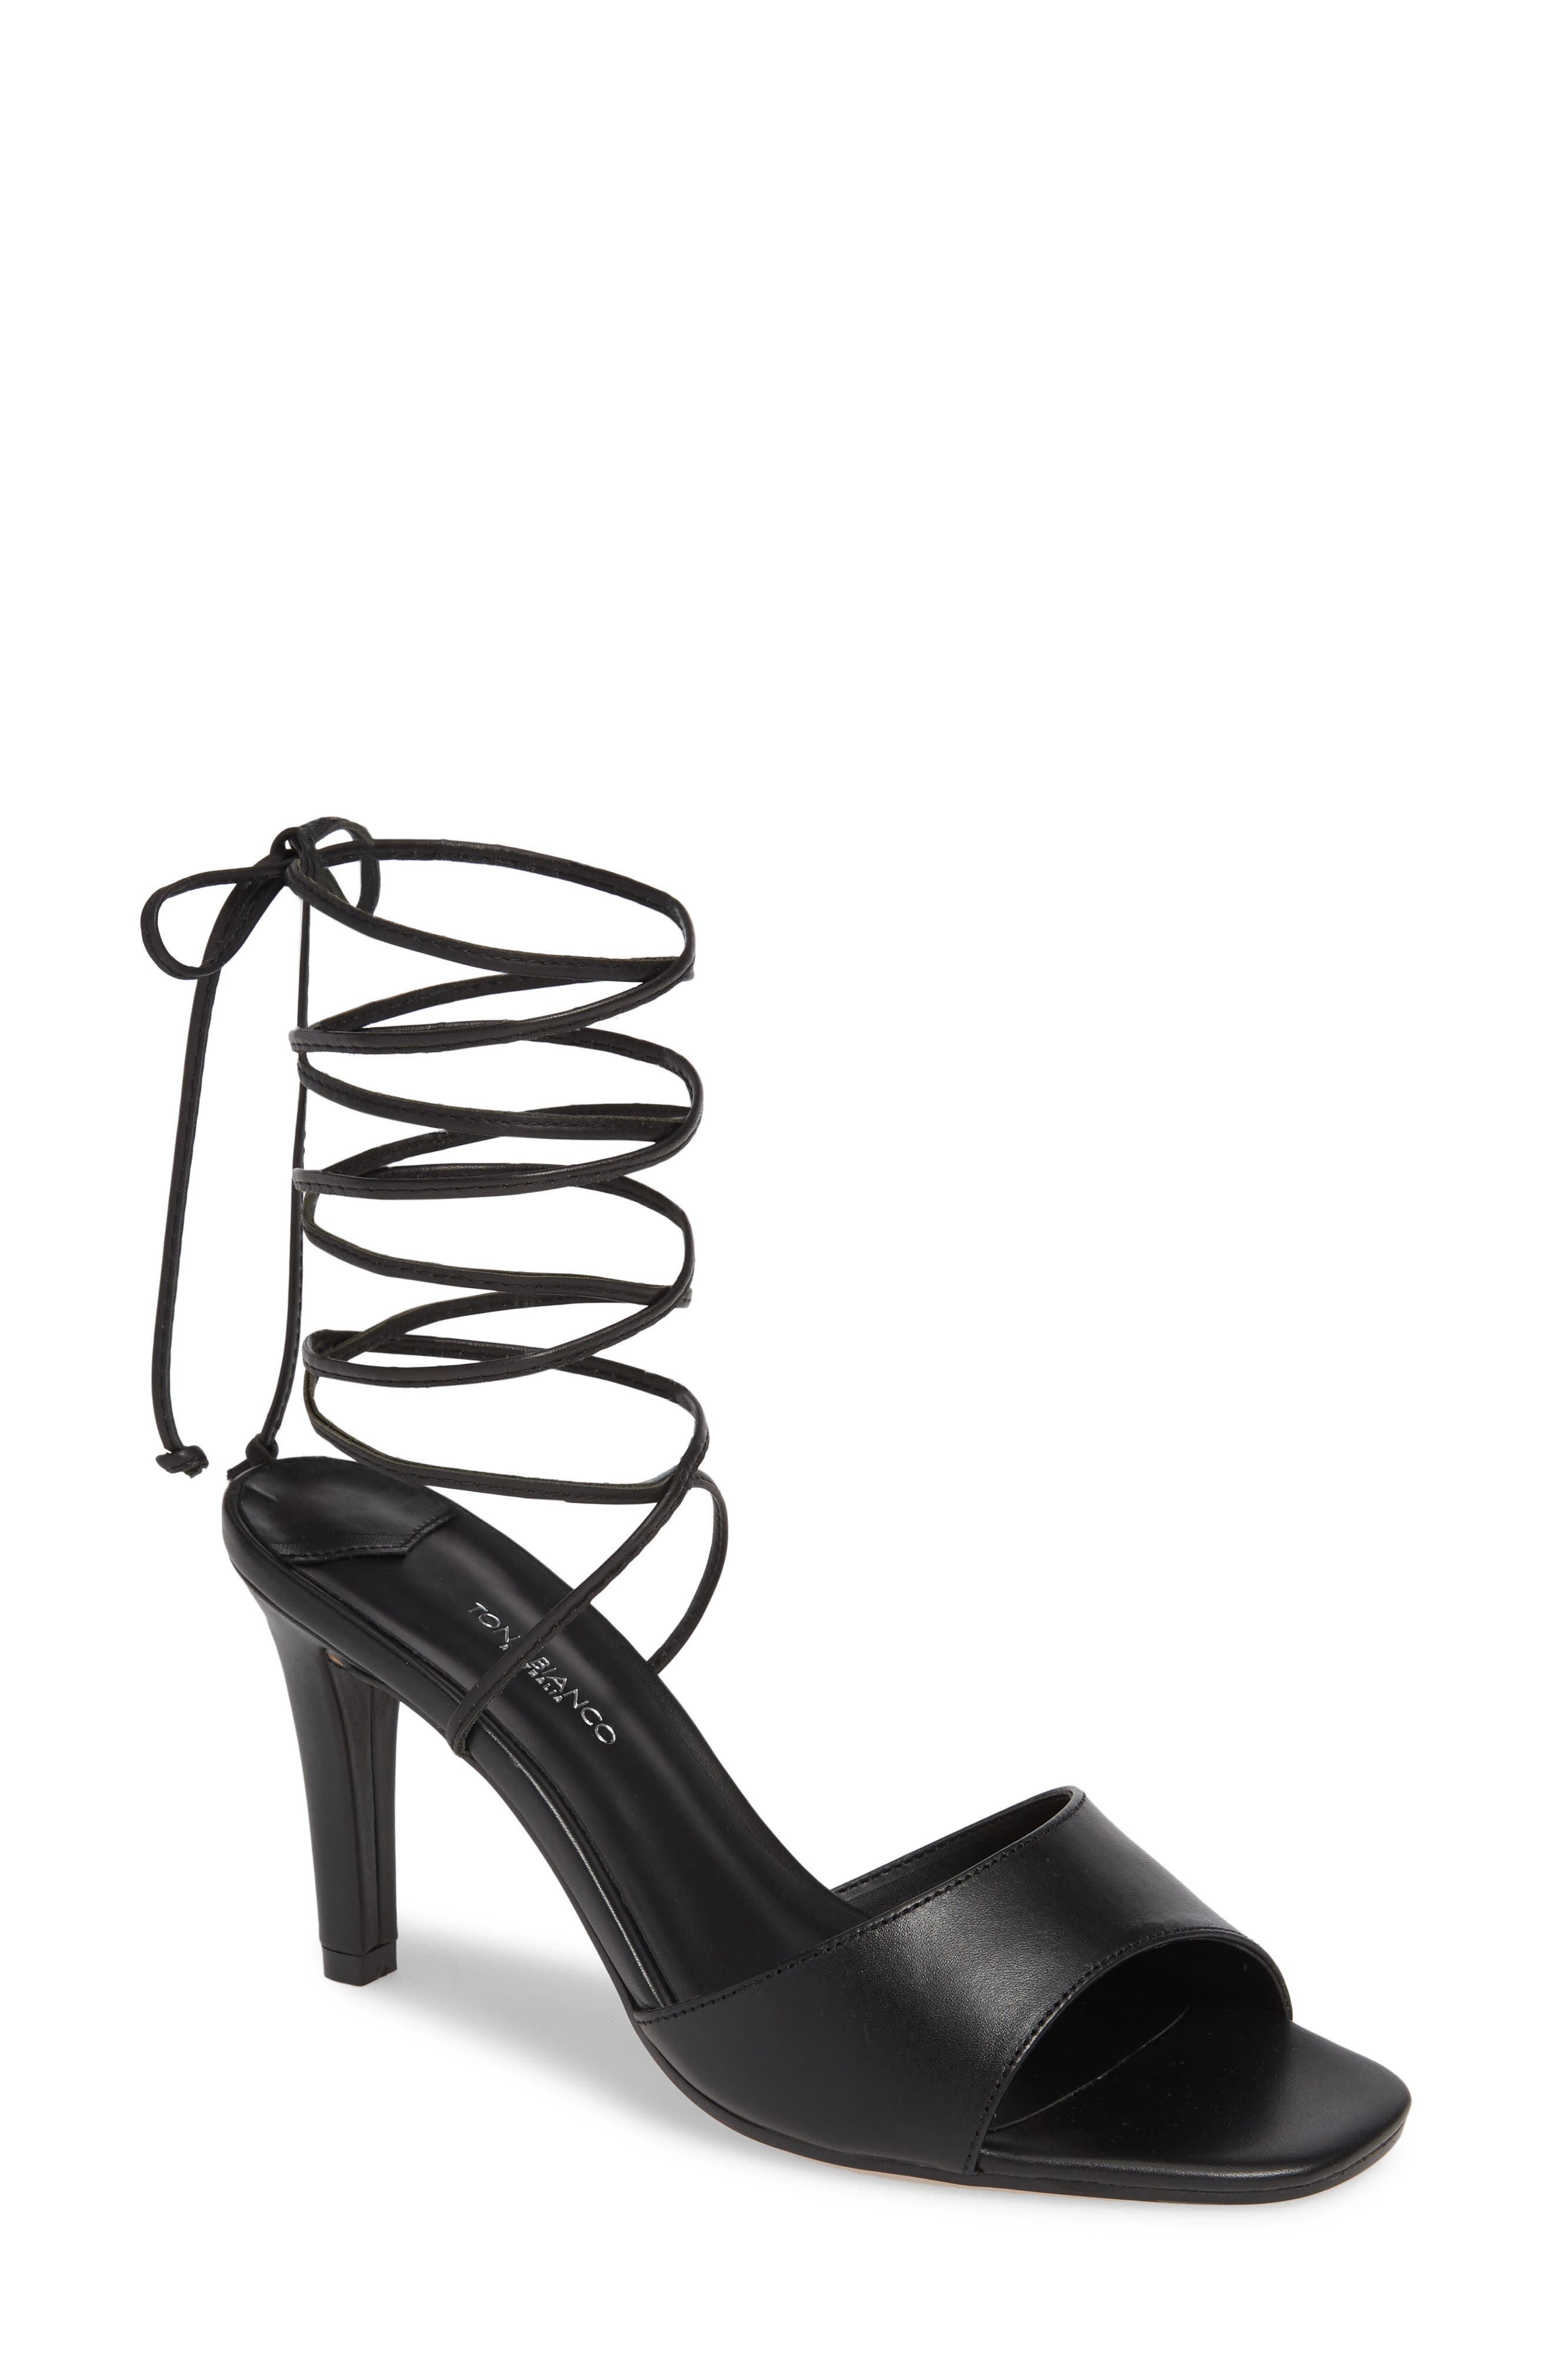 Ruffian Wraparound Sandal,                             Main thumbnail 1, color,                             BLACK COMO